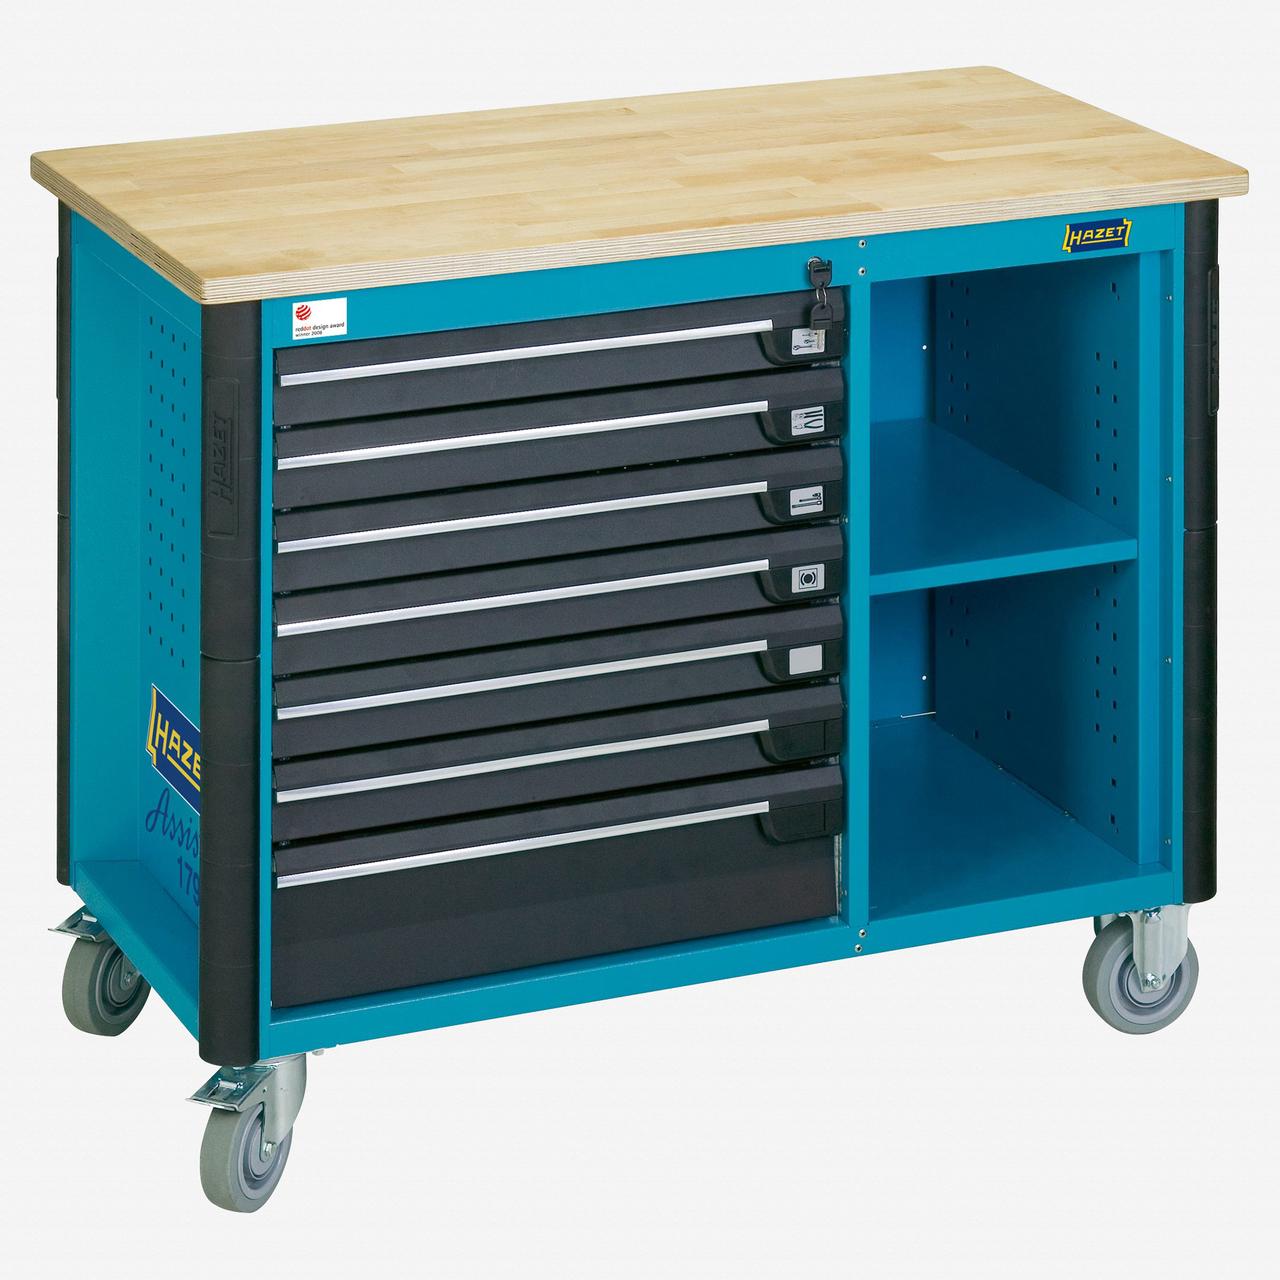 Hazet 179W-7 Mobile work bench  - KC Tool